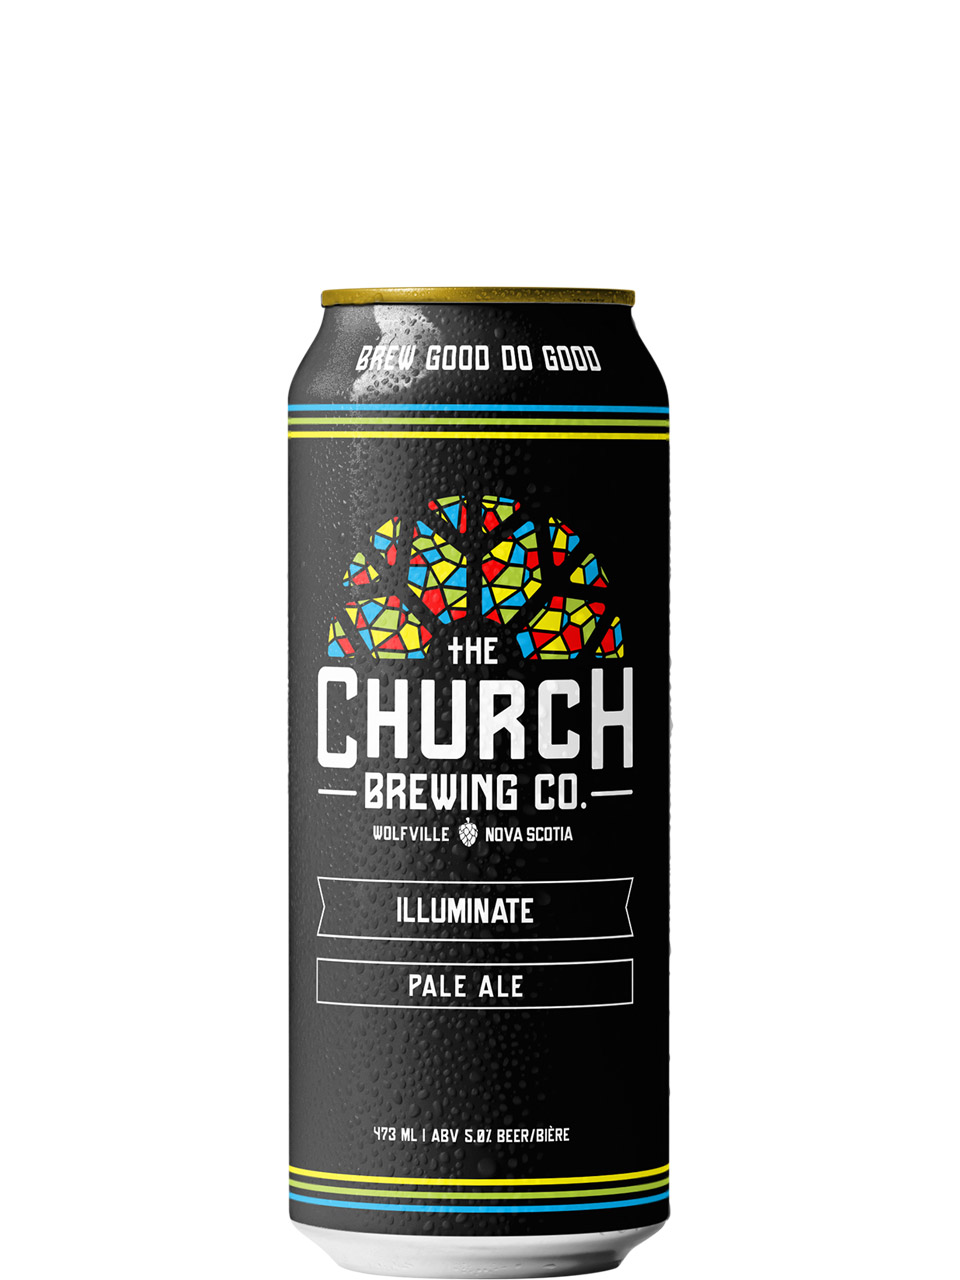 Church Brewing Co. Illuminate Pale Ale 473ml Can